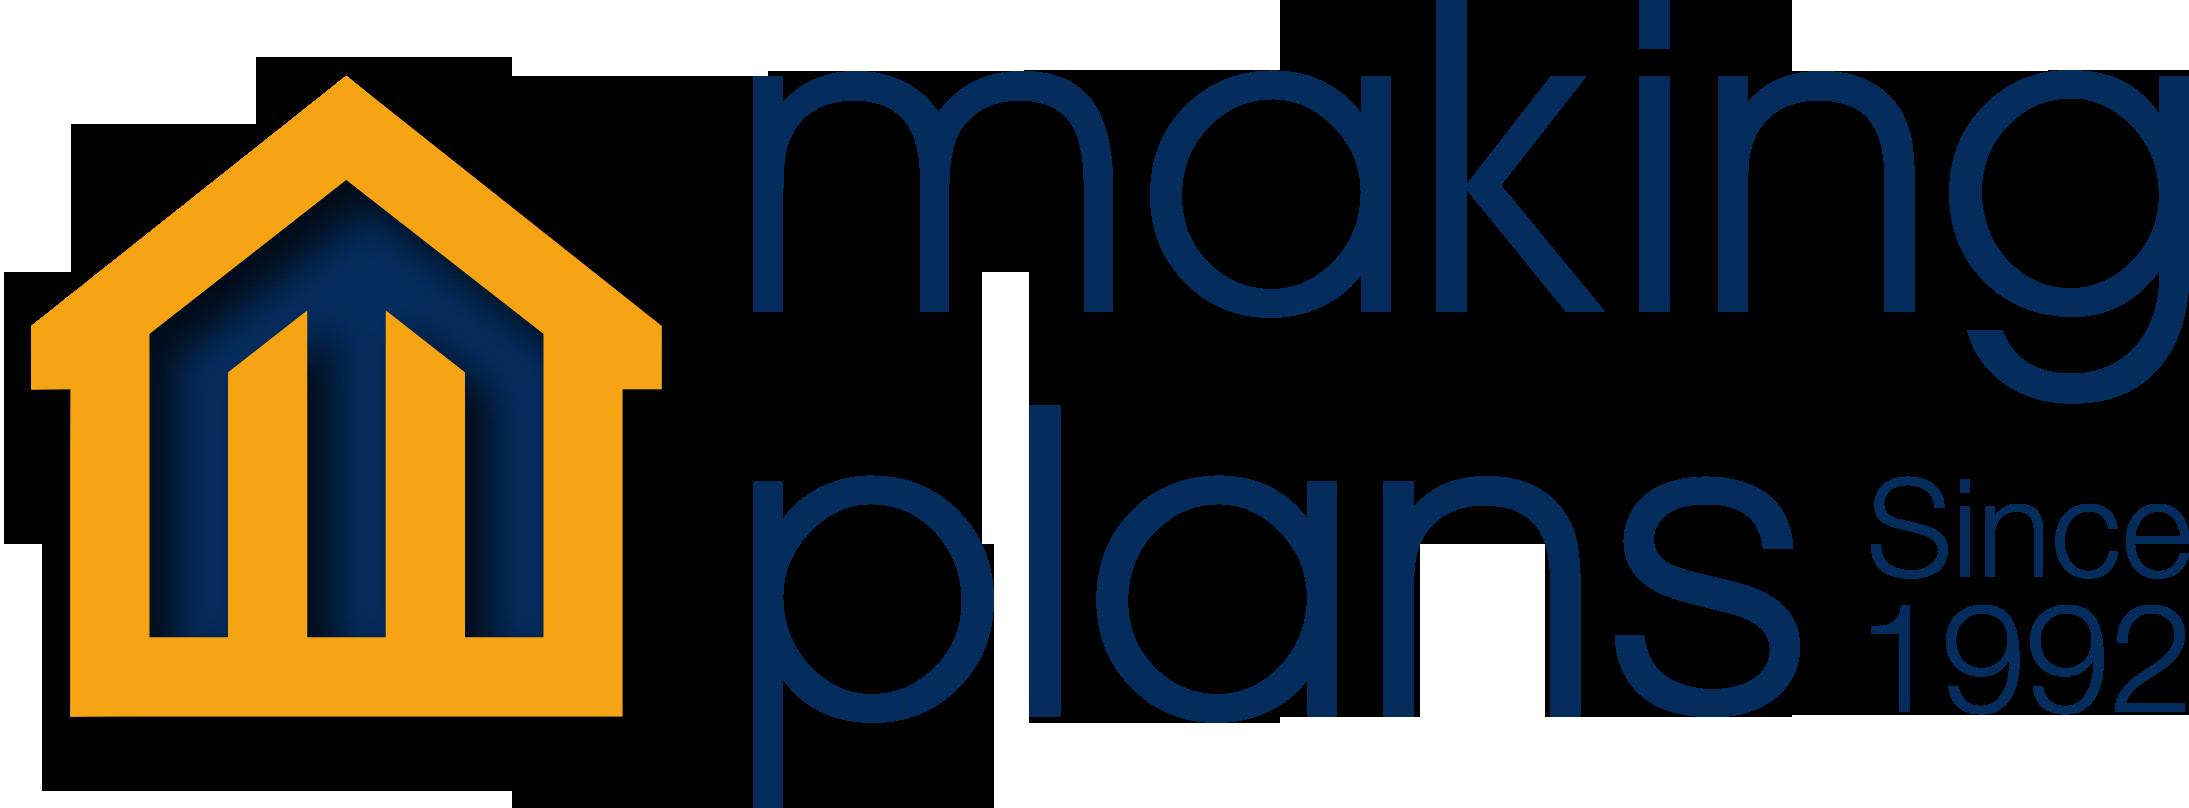 Making Plans Ltd